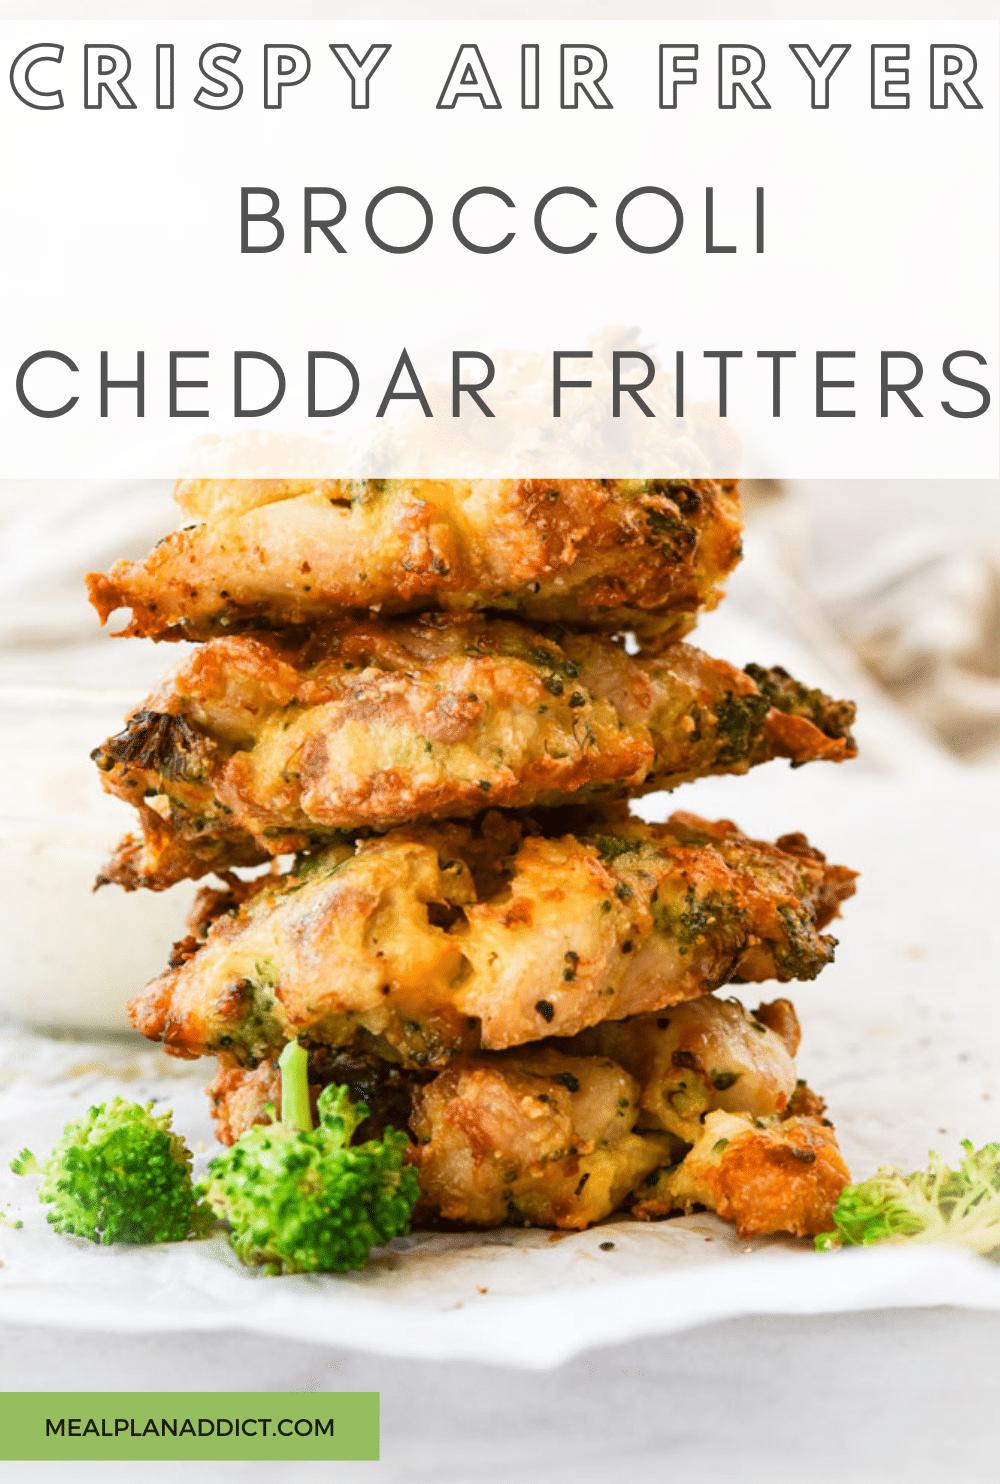 Crispy Air Fryer Broccoli Cheddar Fritters | Meal Plan Addict